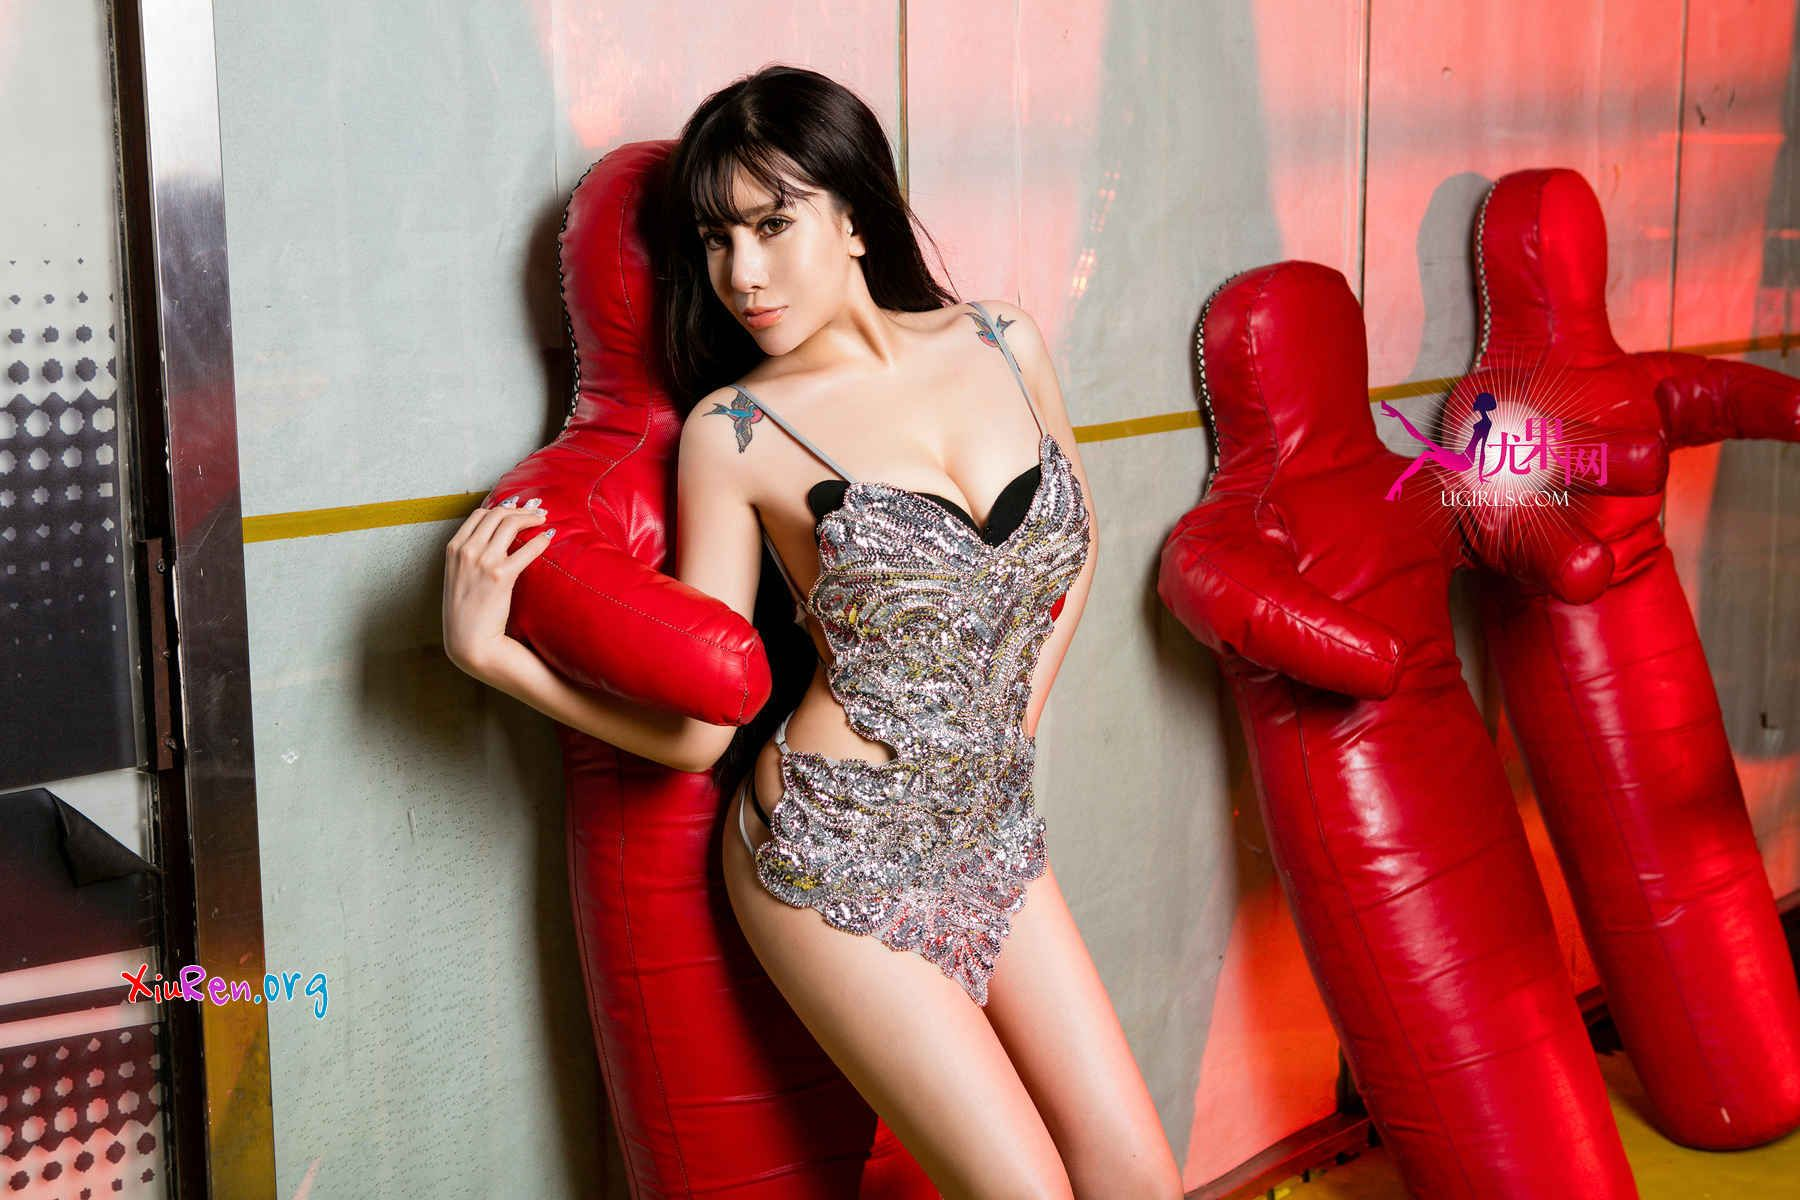 Asian Hot & Sexy Model - [Ugirl] 172 杨佩 Yang Pei   For Video Visit https://www.youtube.com/channel/UCNbFr8qw6ZlJ2lYlyUc-TzA